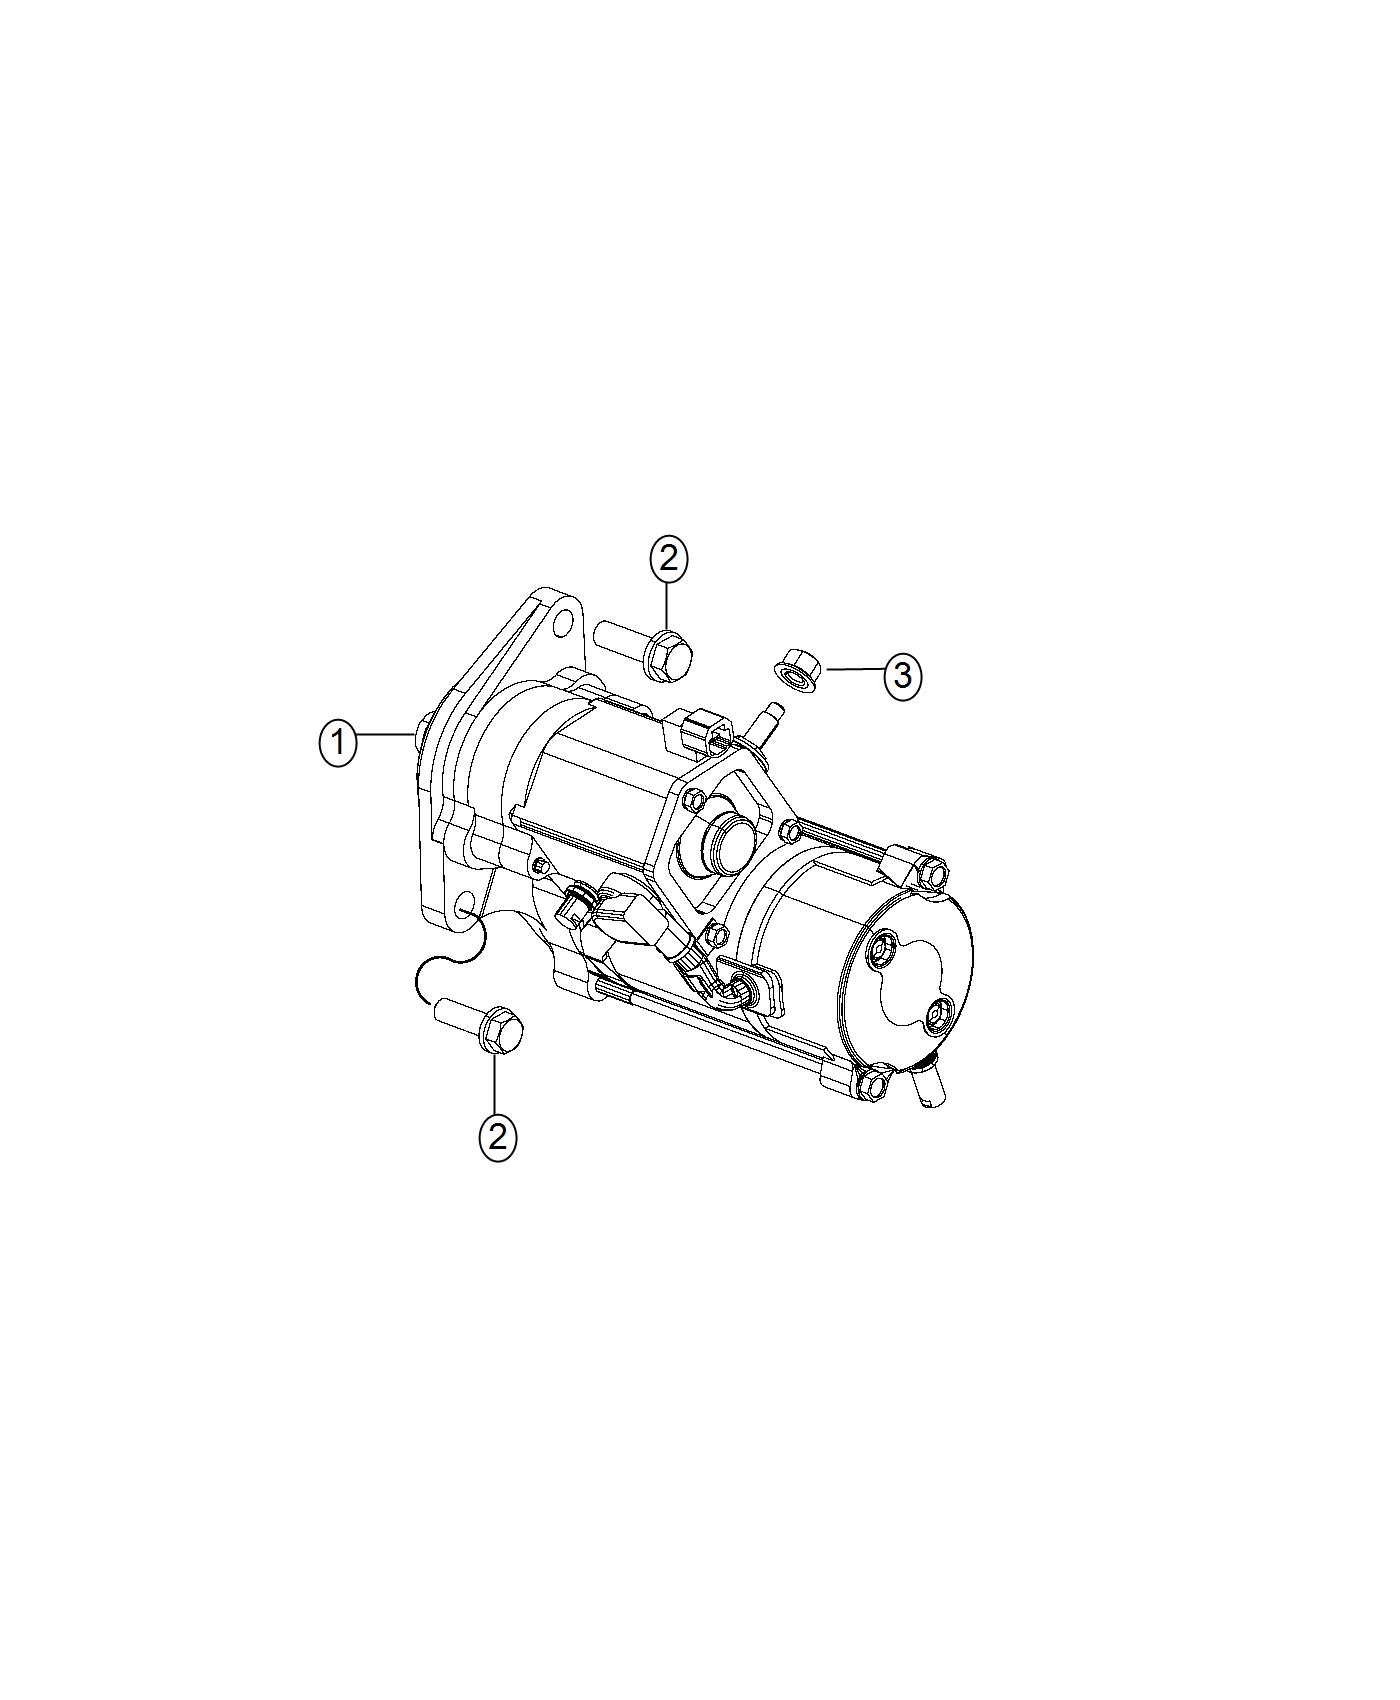 Dodge Viper Starter Engine Maintenance Starters